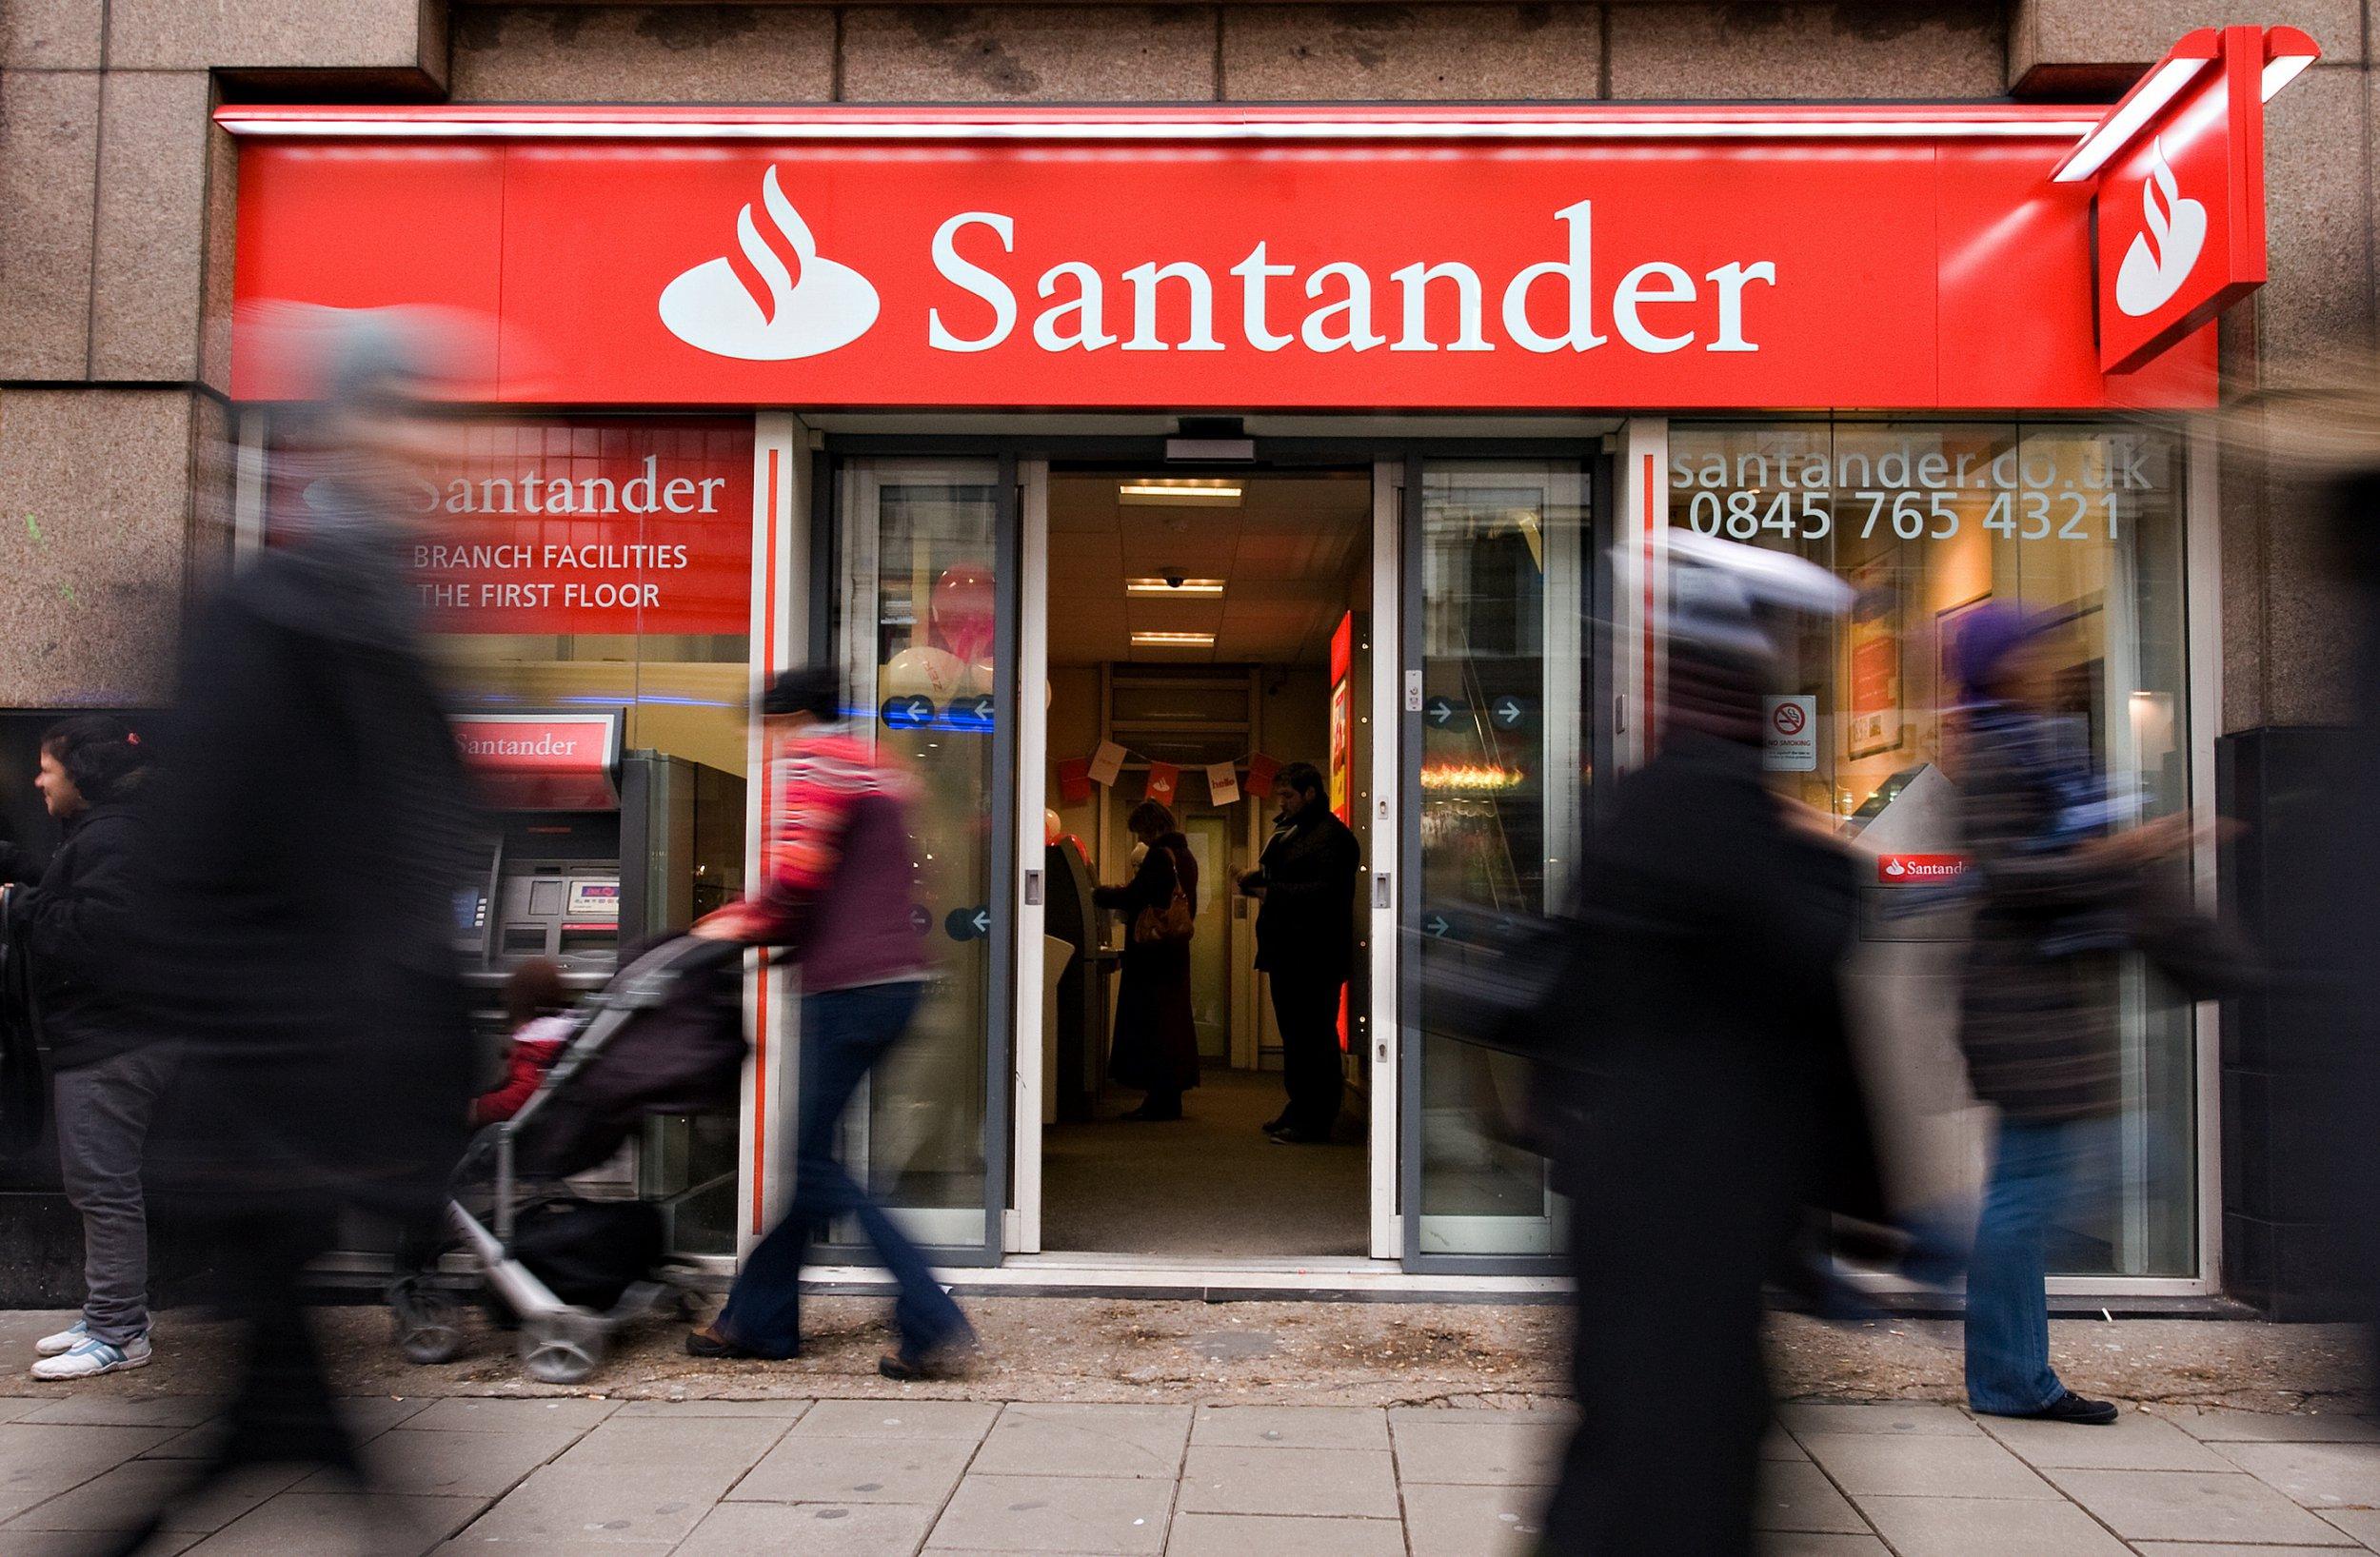 Santander bank on Oxford Street